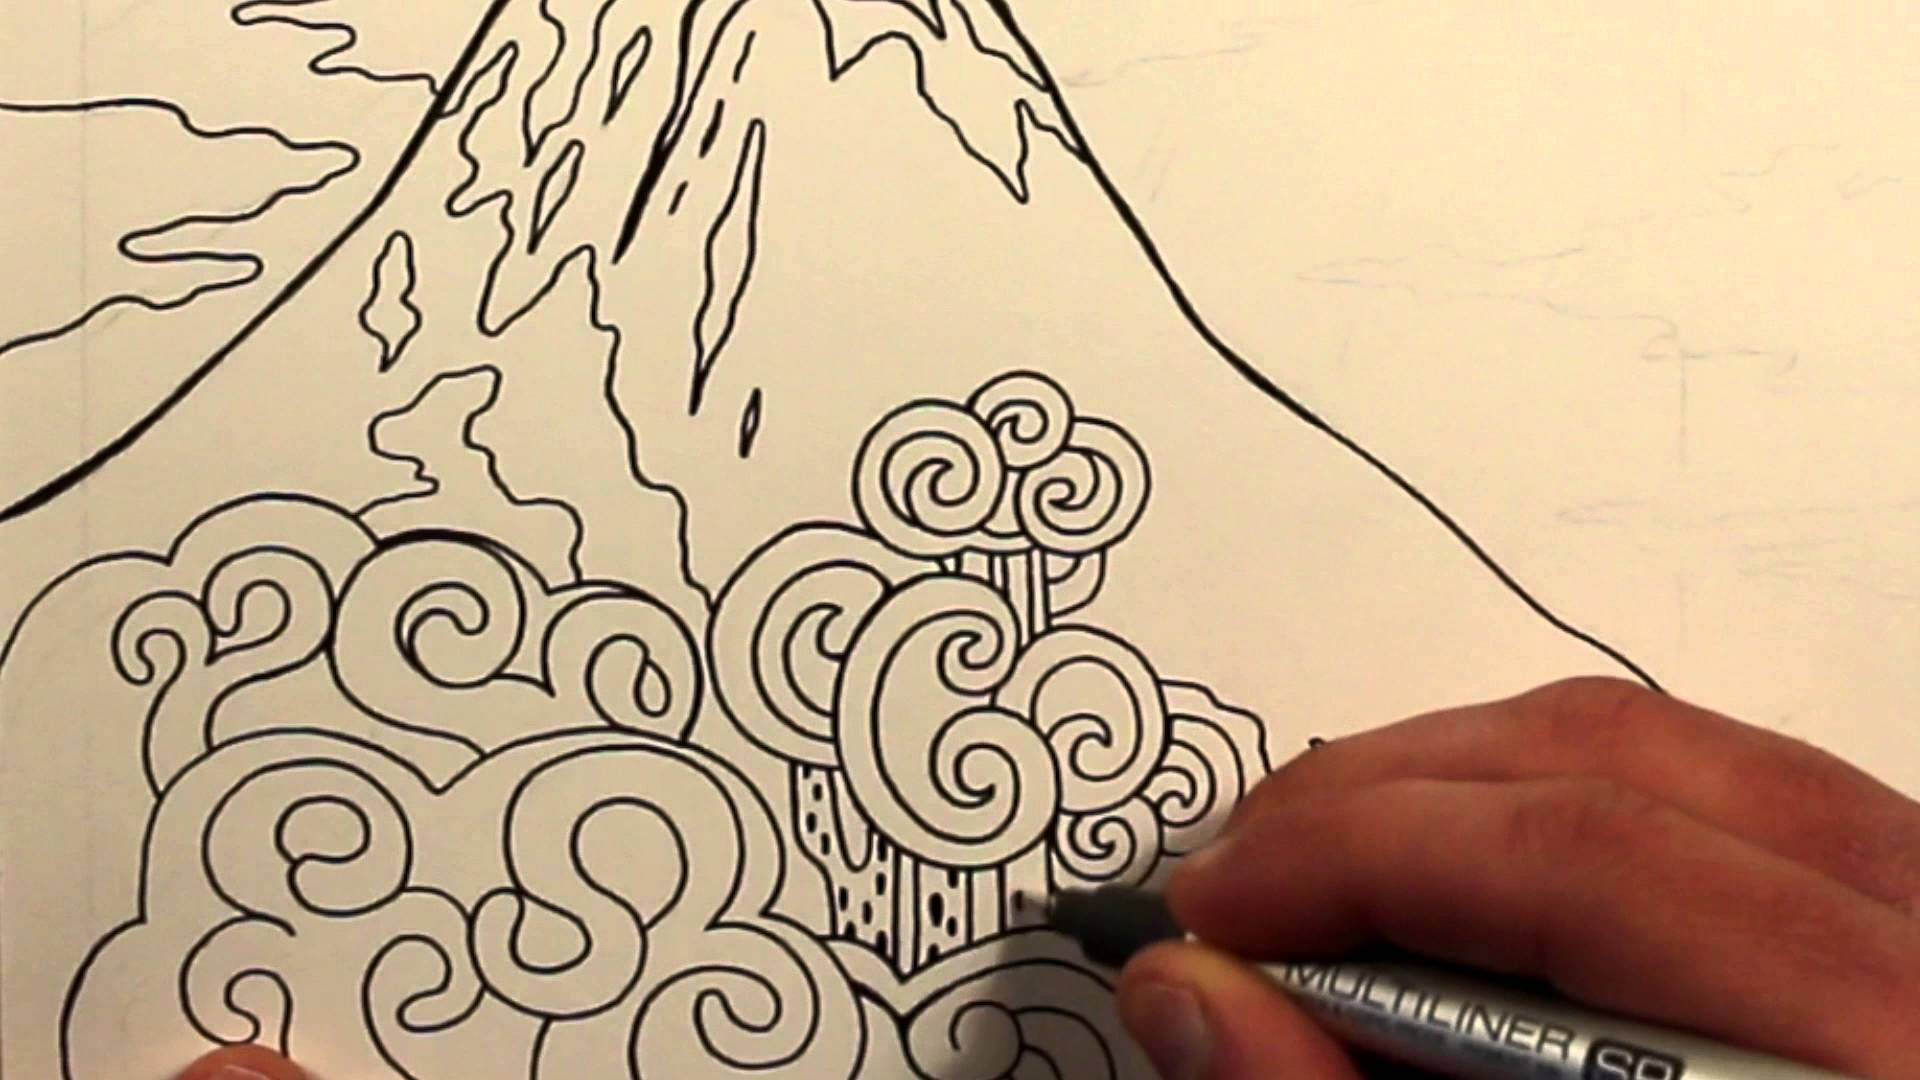 Drawn volcano volcano eruption An An Drawing Erupting Volcano